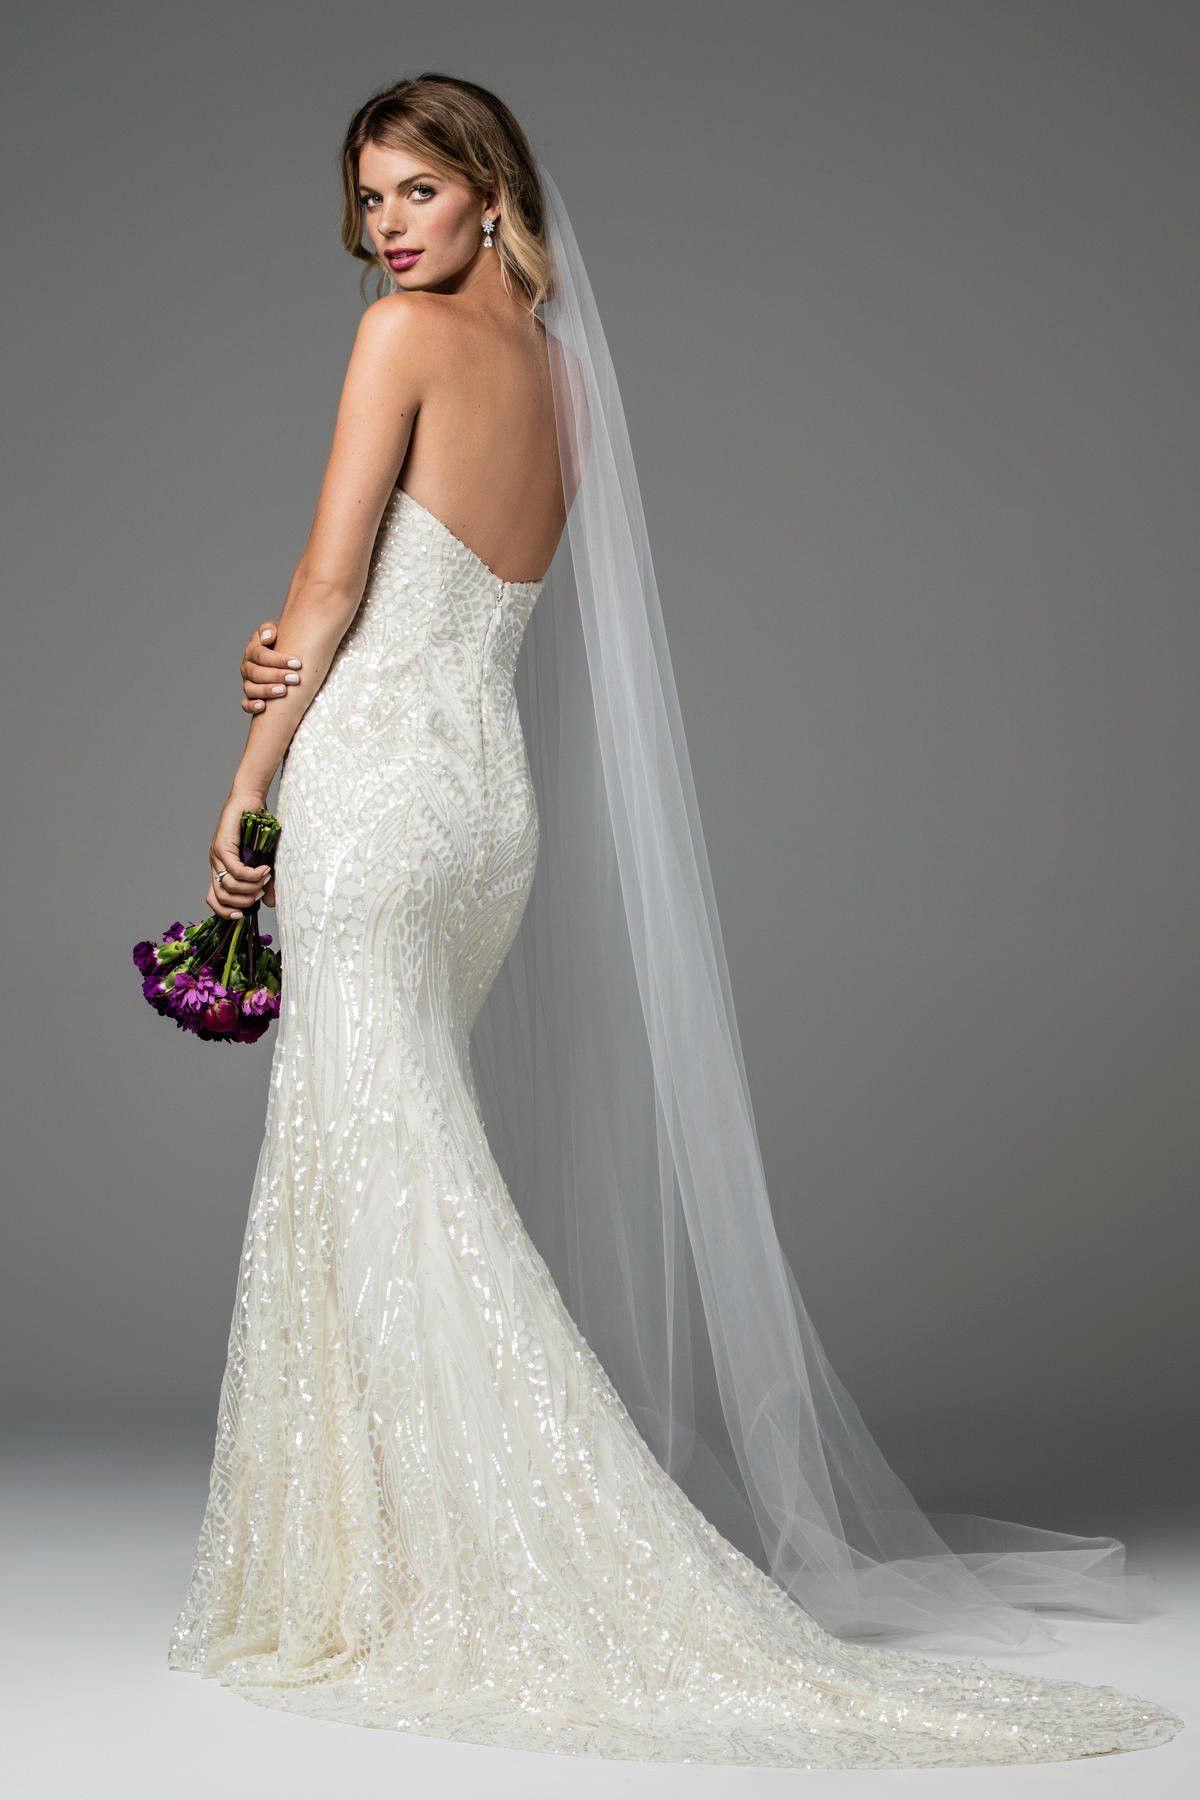 Wedding dresses fresno  Nina  Pinterest  Wtoo bridal Bridal gowns and Wedding